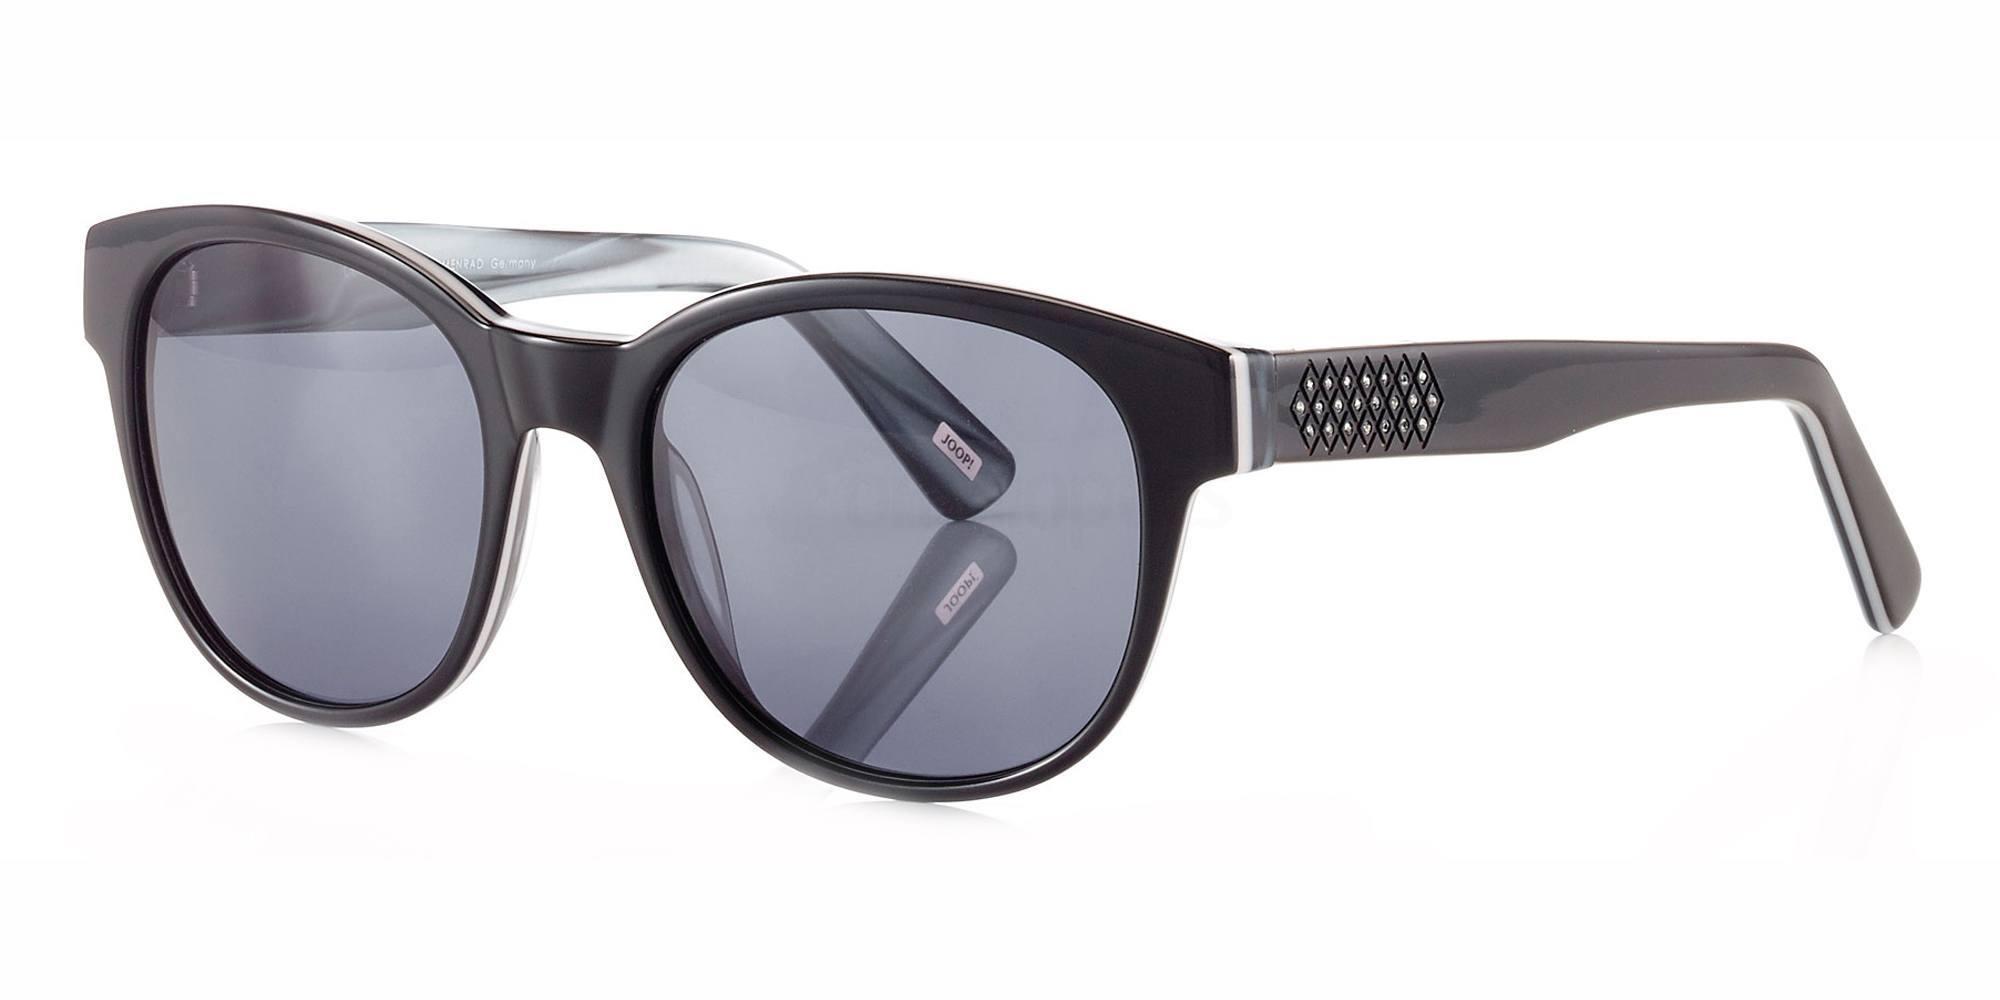 4059 87194 , JOOP Eyewear